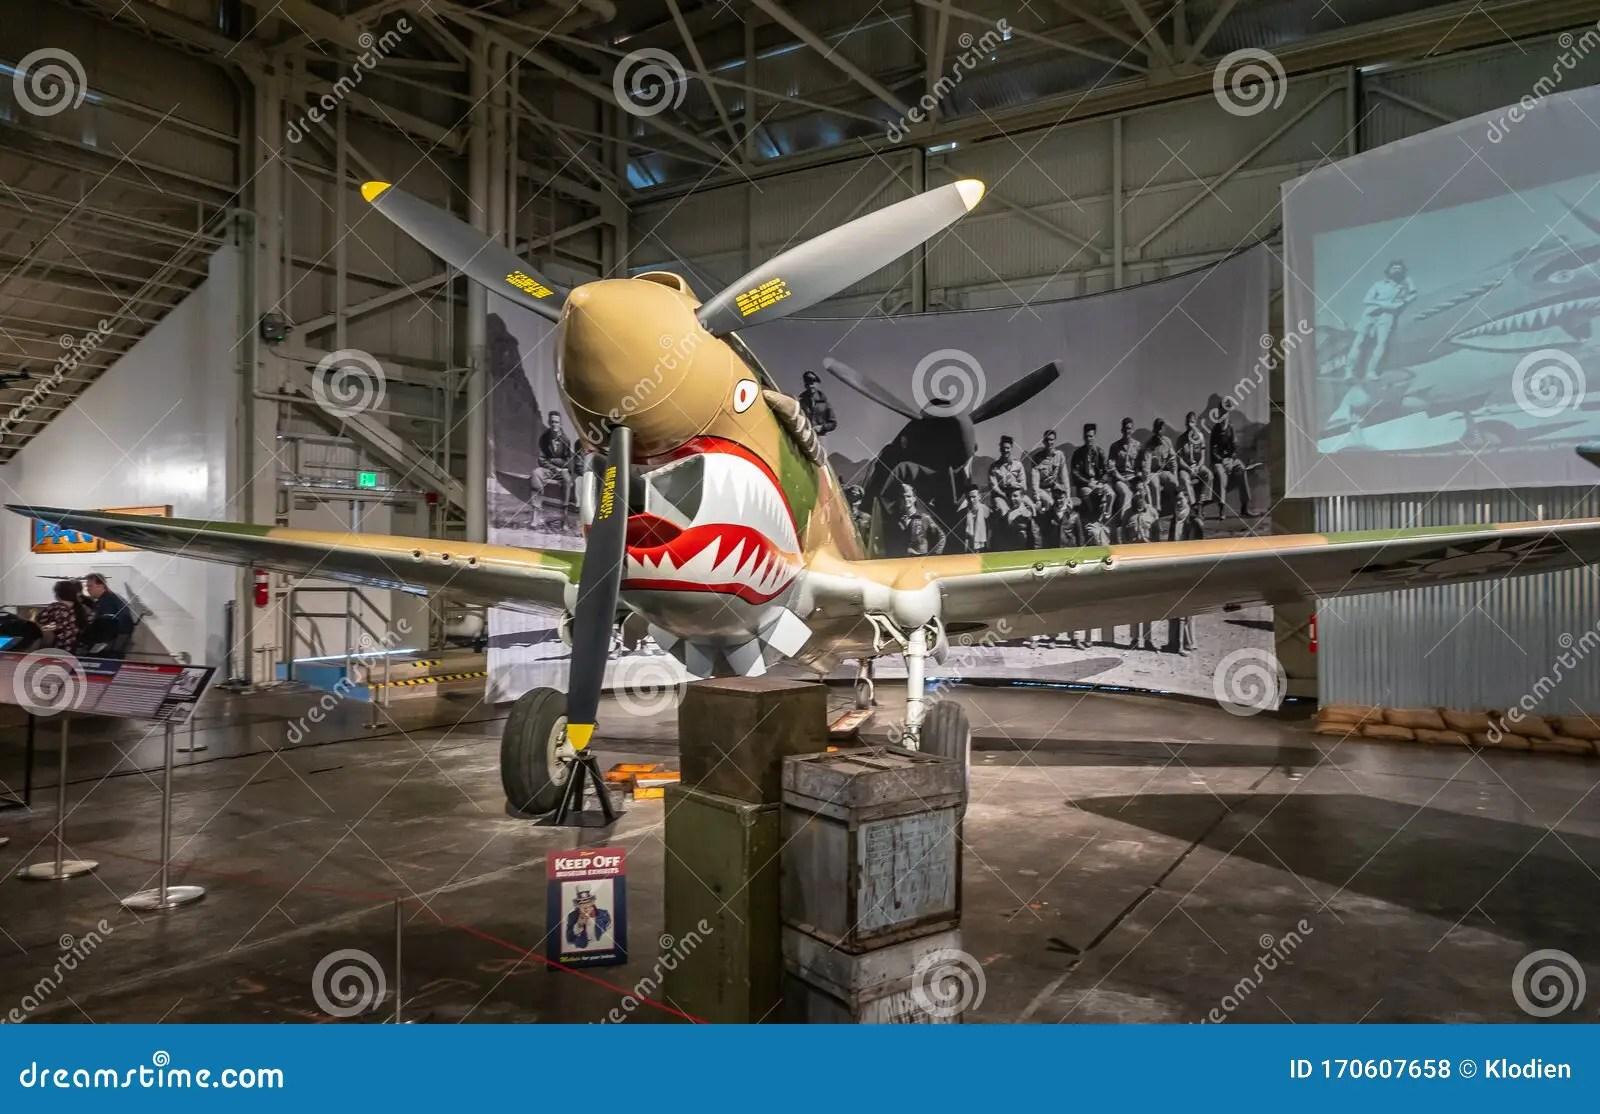 Curtiss P 40e Warhawk Aircraft In Pearl Harbor Aviation